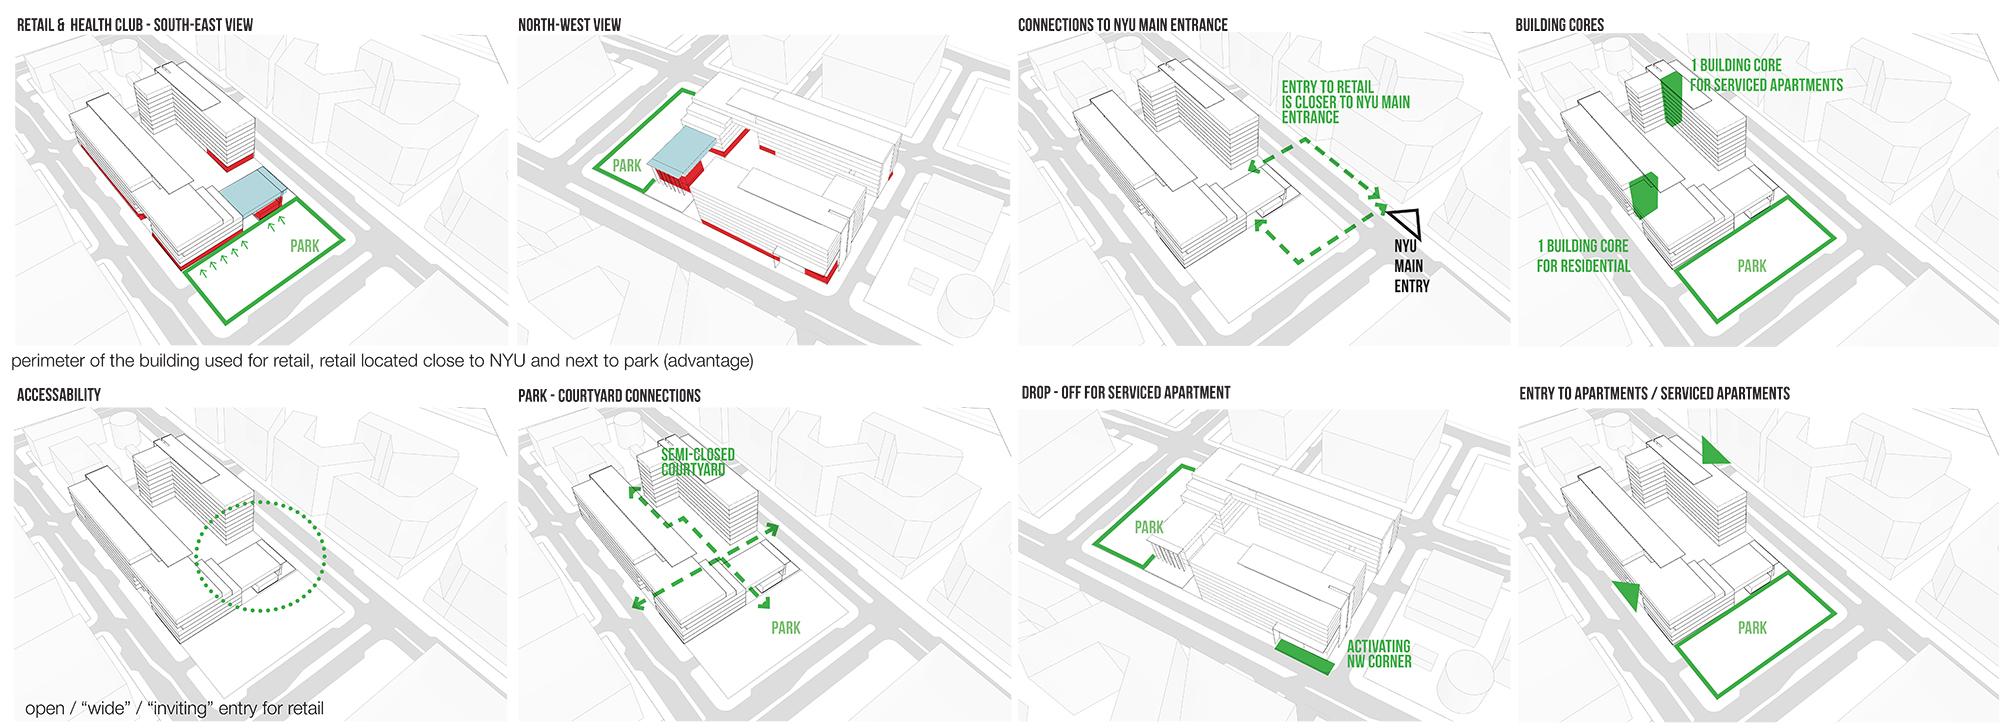 BEAD residential serviced apartments NYU diagrams.JPG